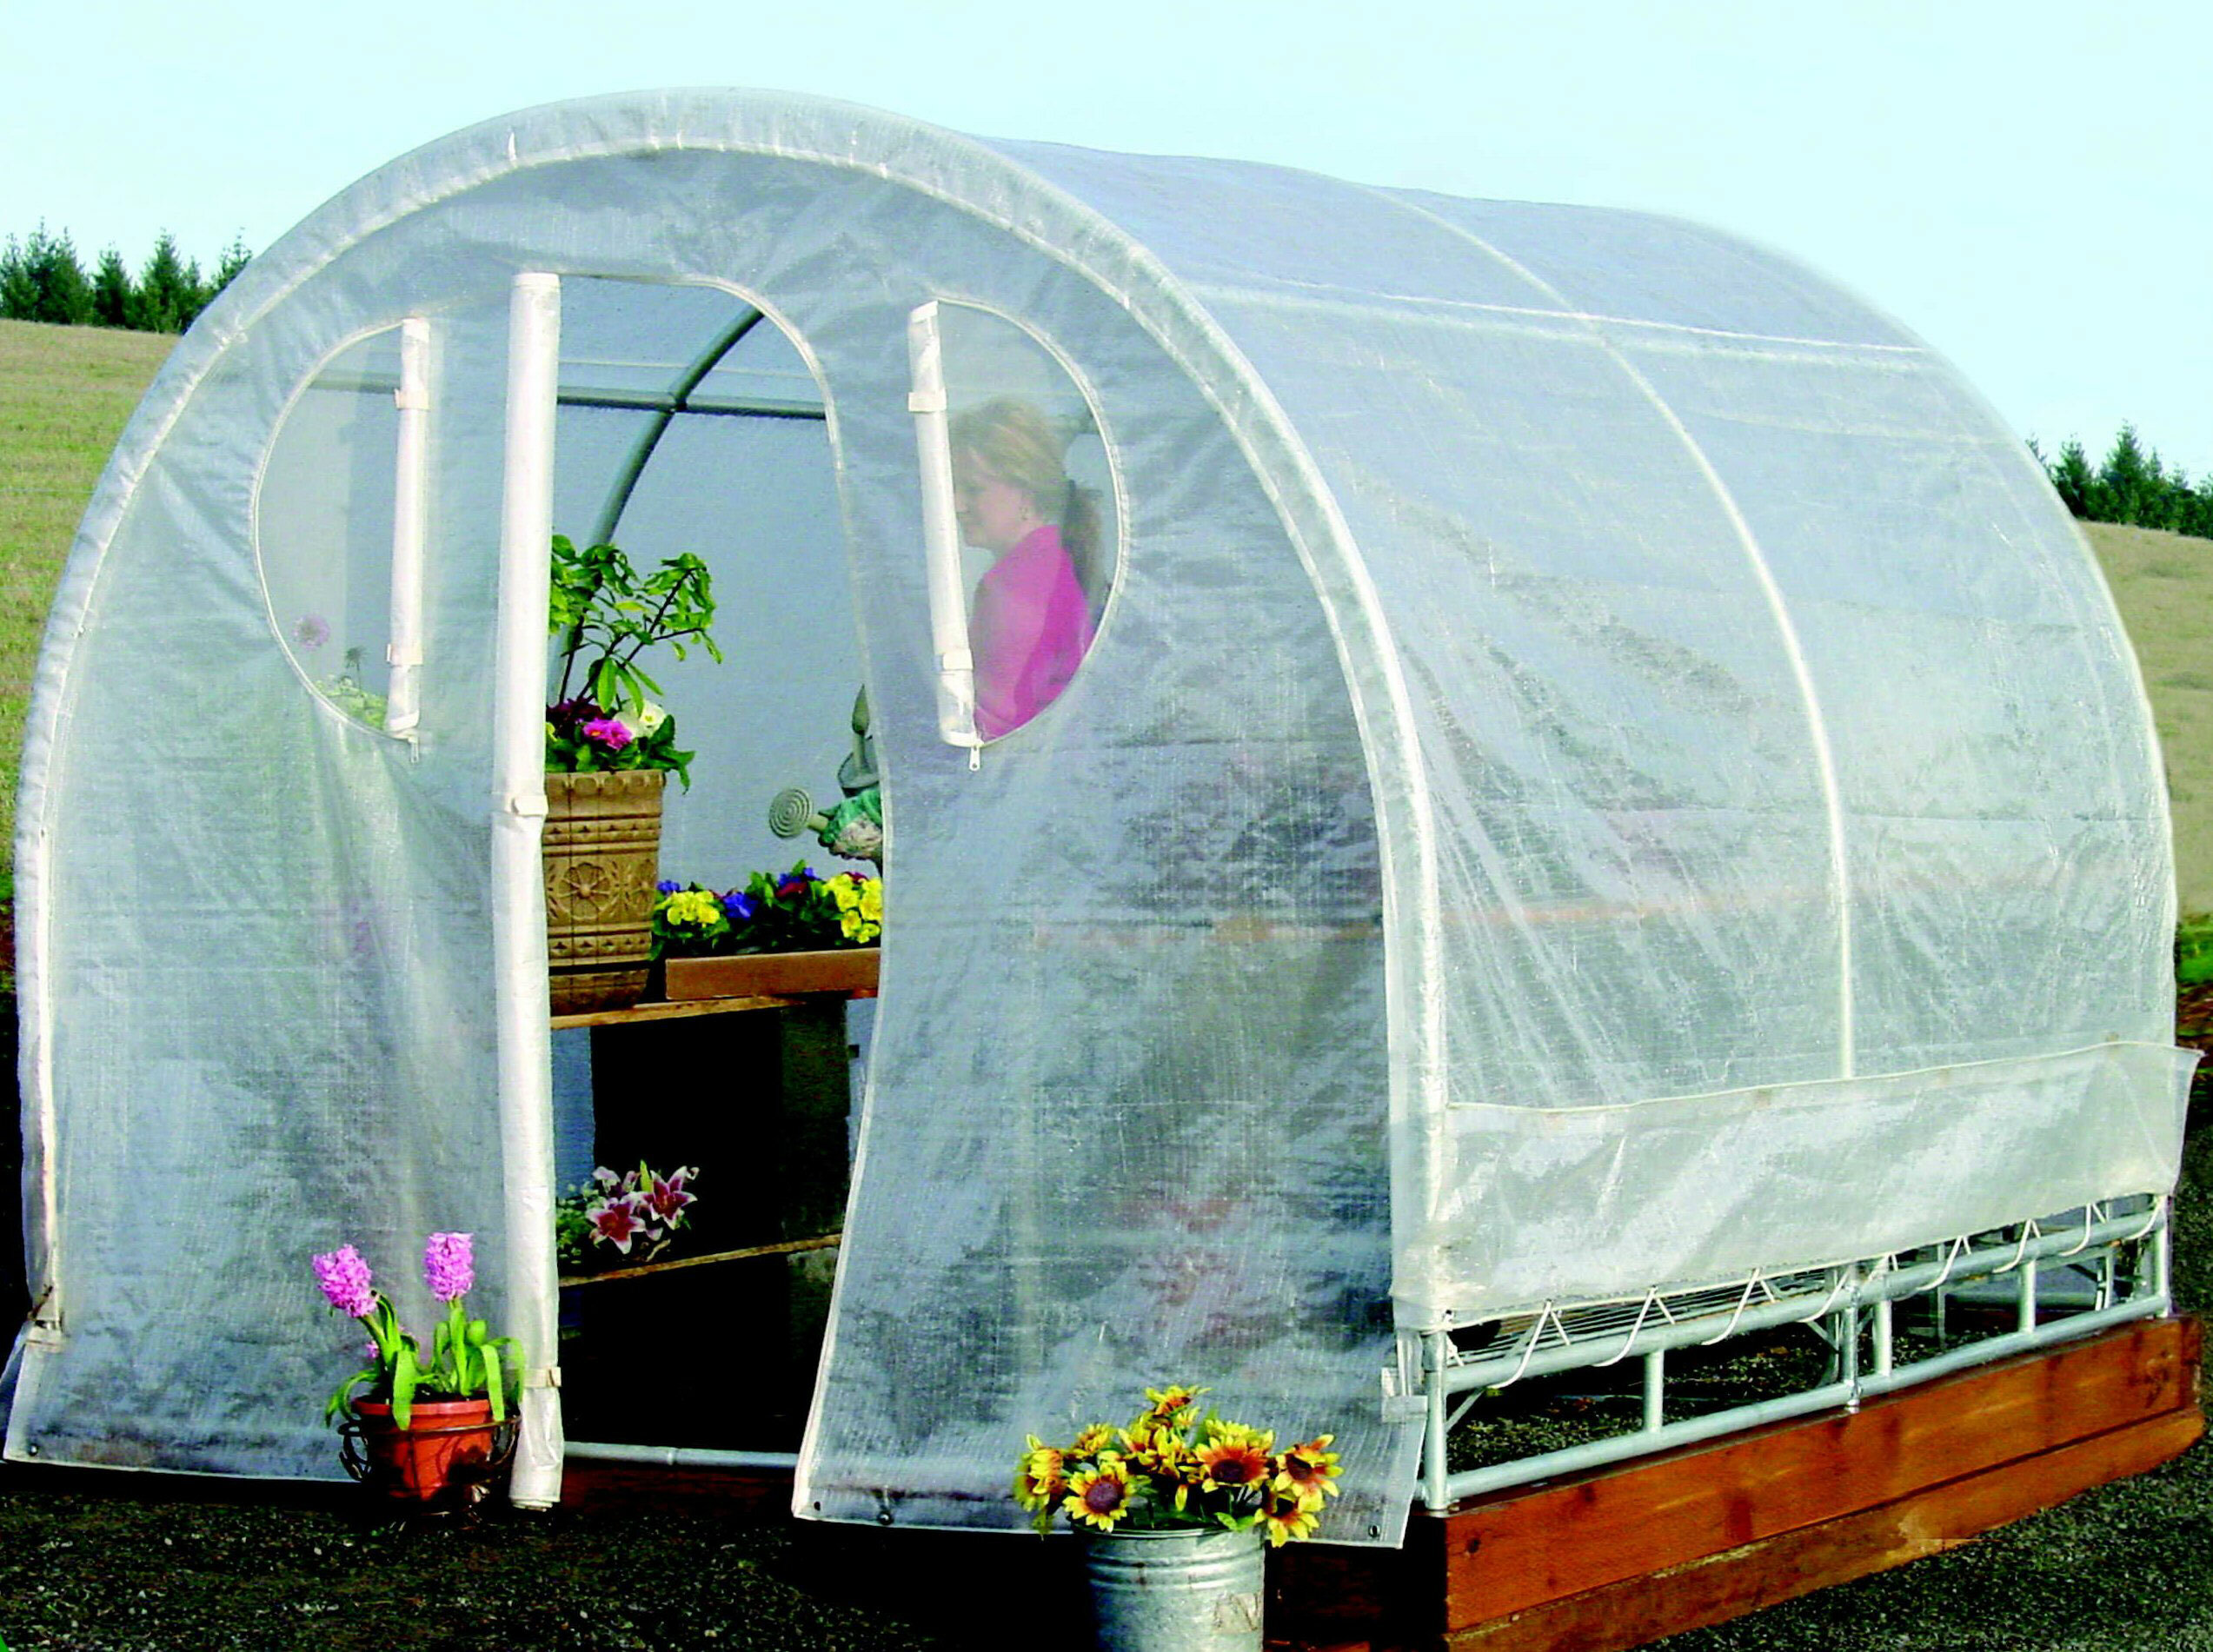 Jewett Cameron Weatherguard 8 Ft. W x 12 Ft. D Commercial Greenhouse ...